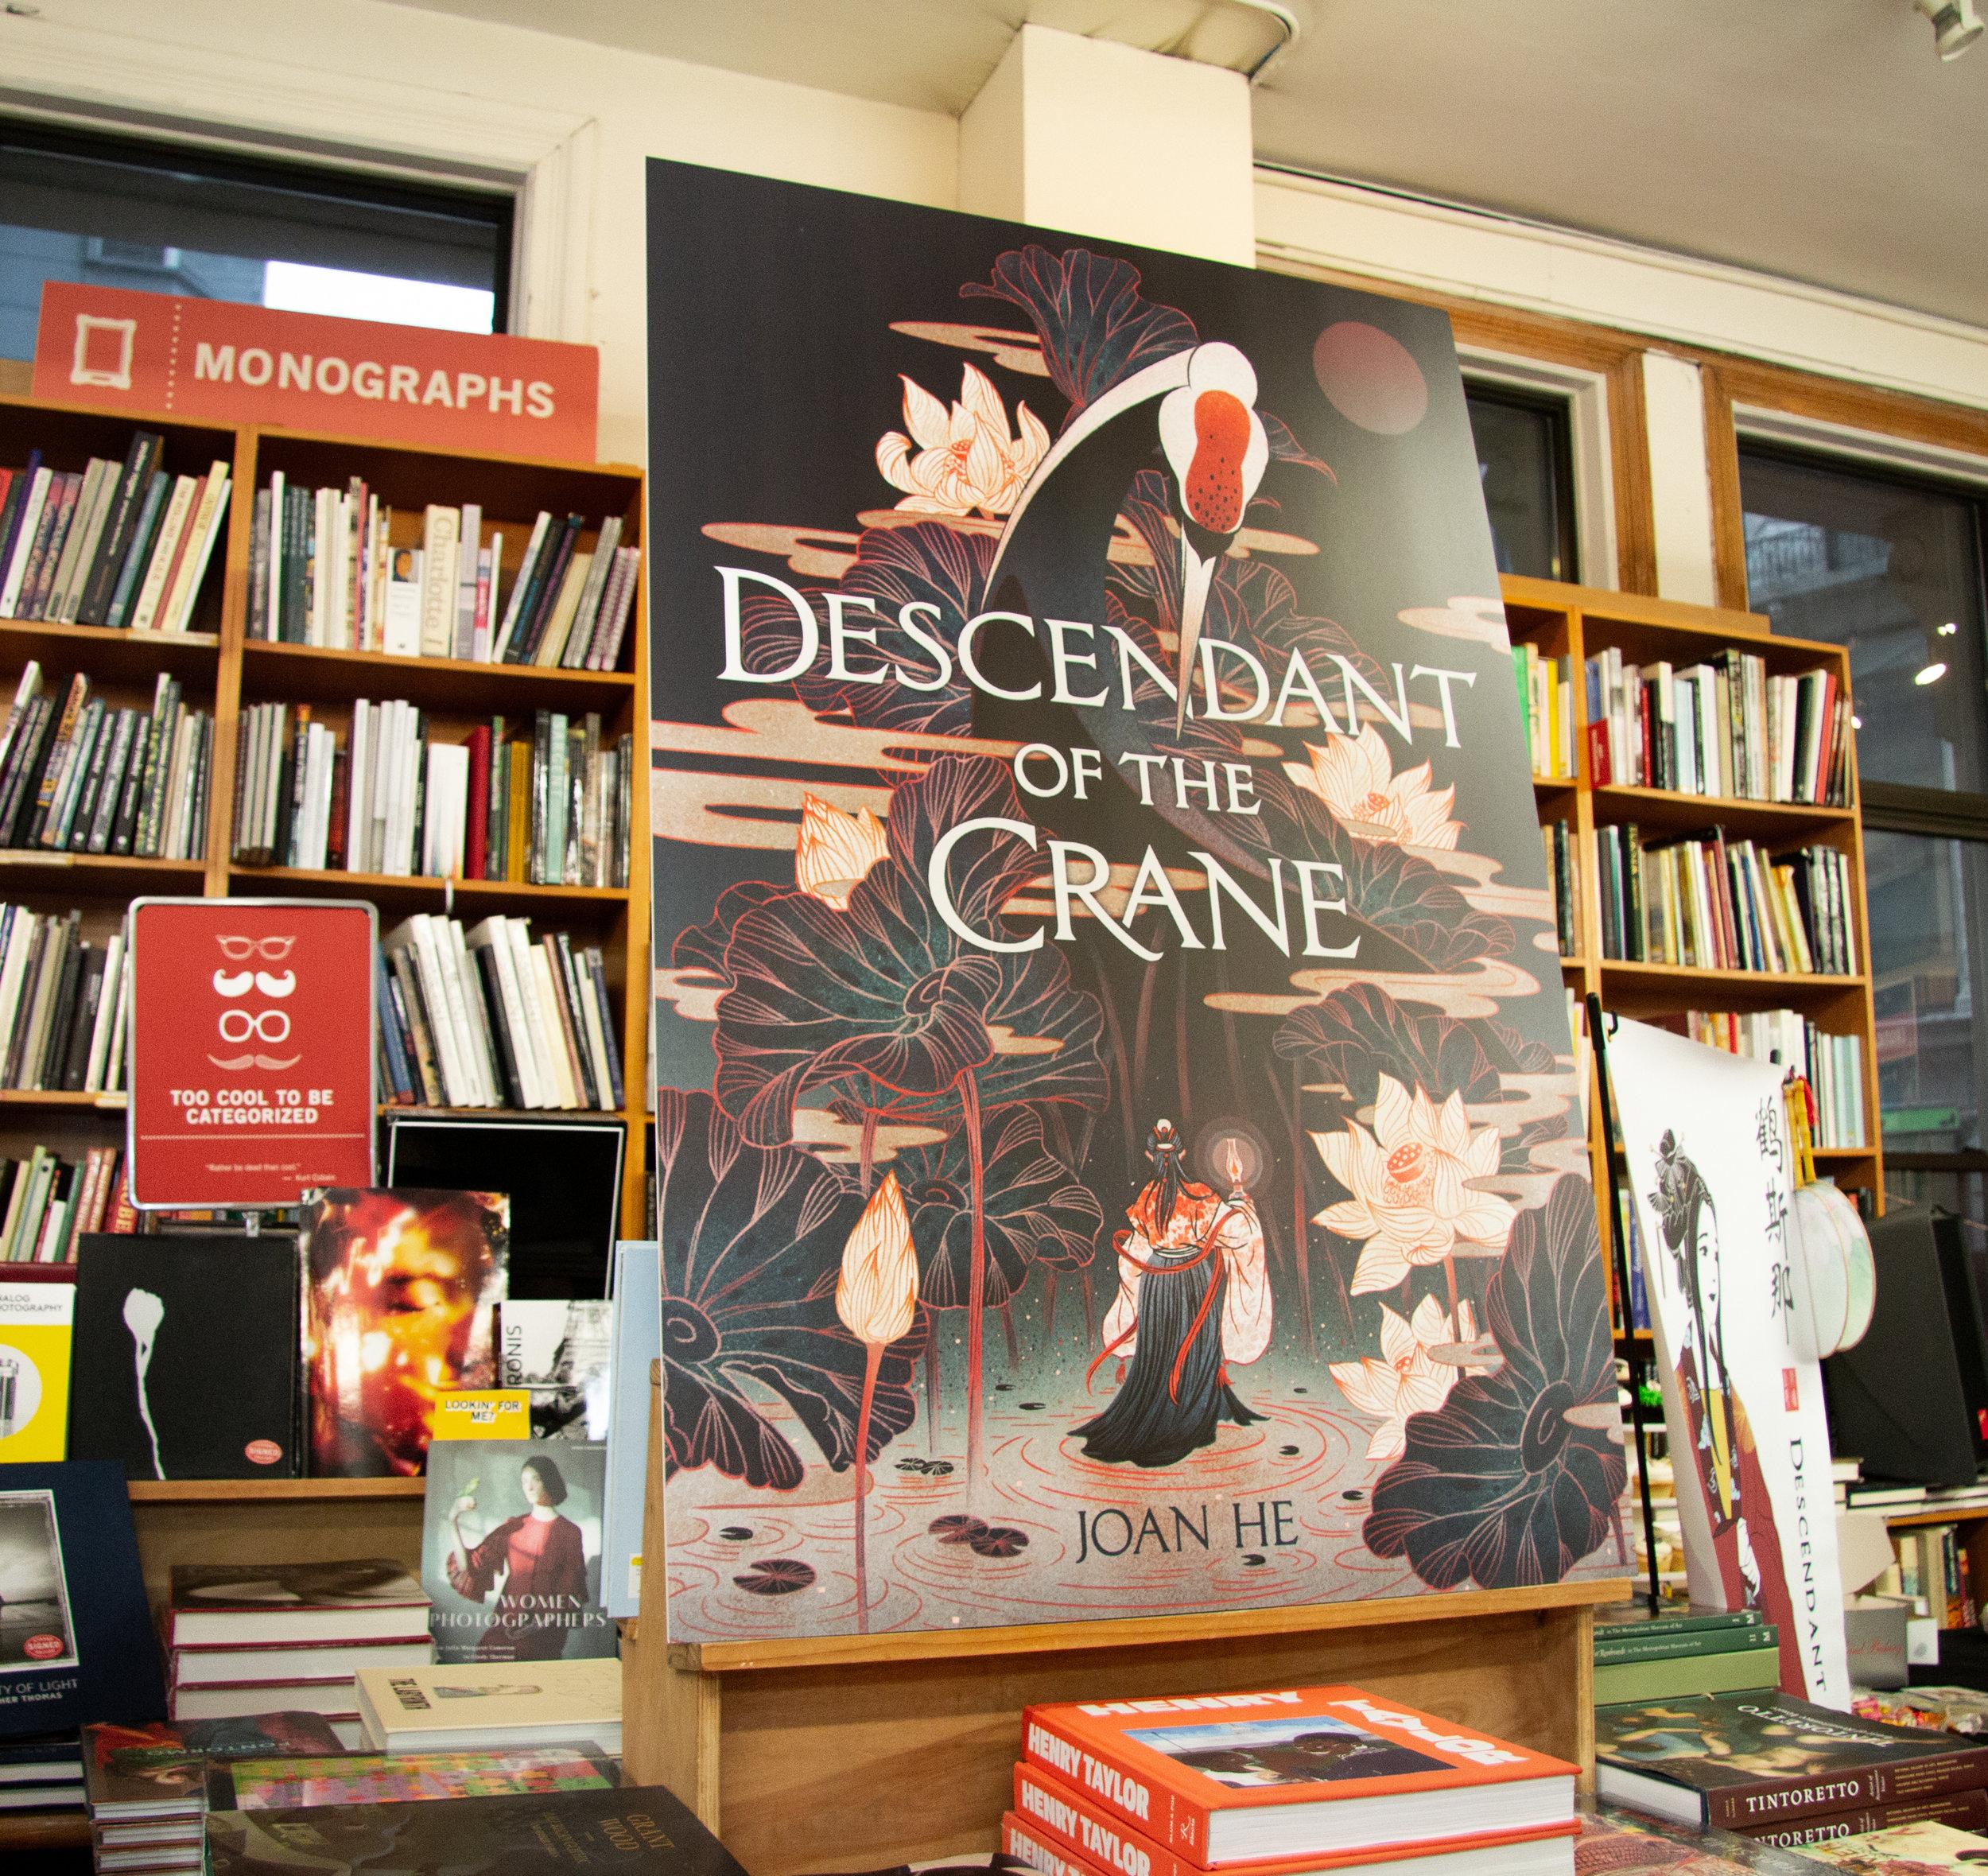 April 9th, 2019 - Descendant of the Crane book launch @ Strand Bookstore, NYCEvent Photographer: Cydney Blitzer